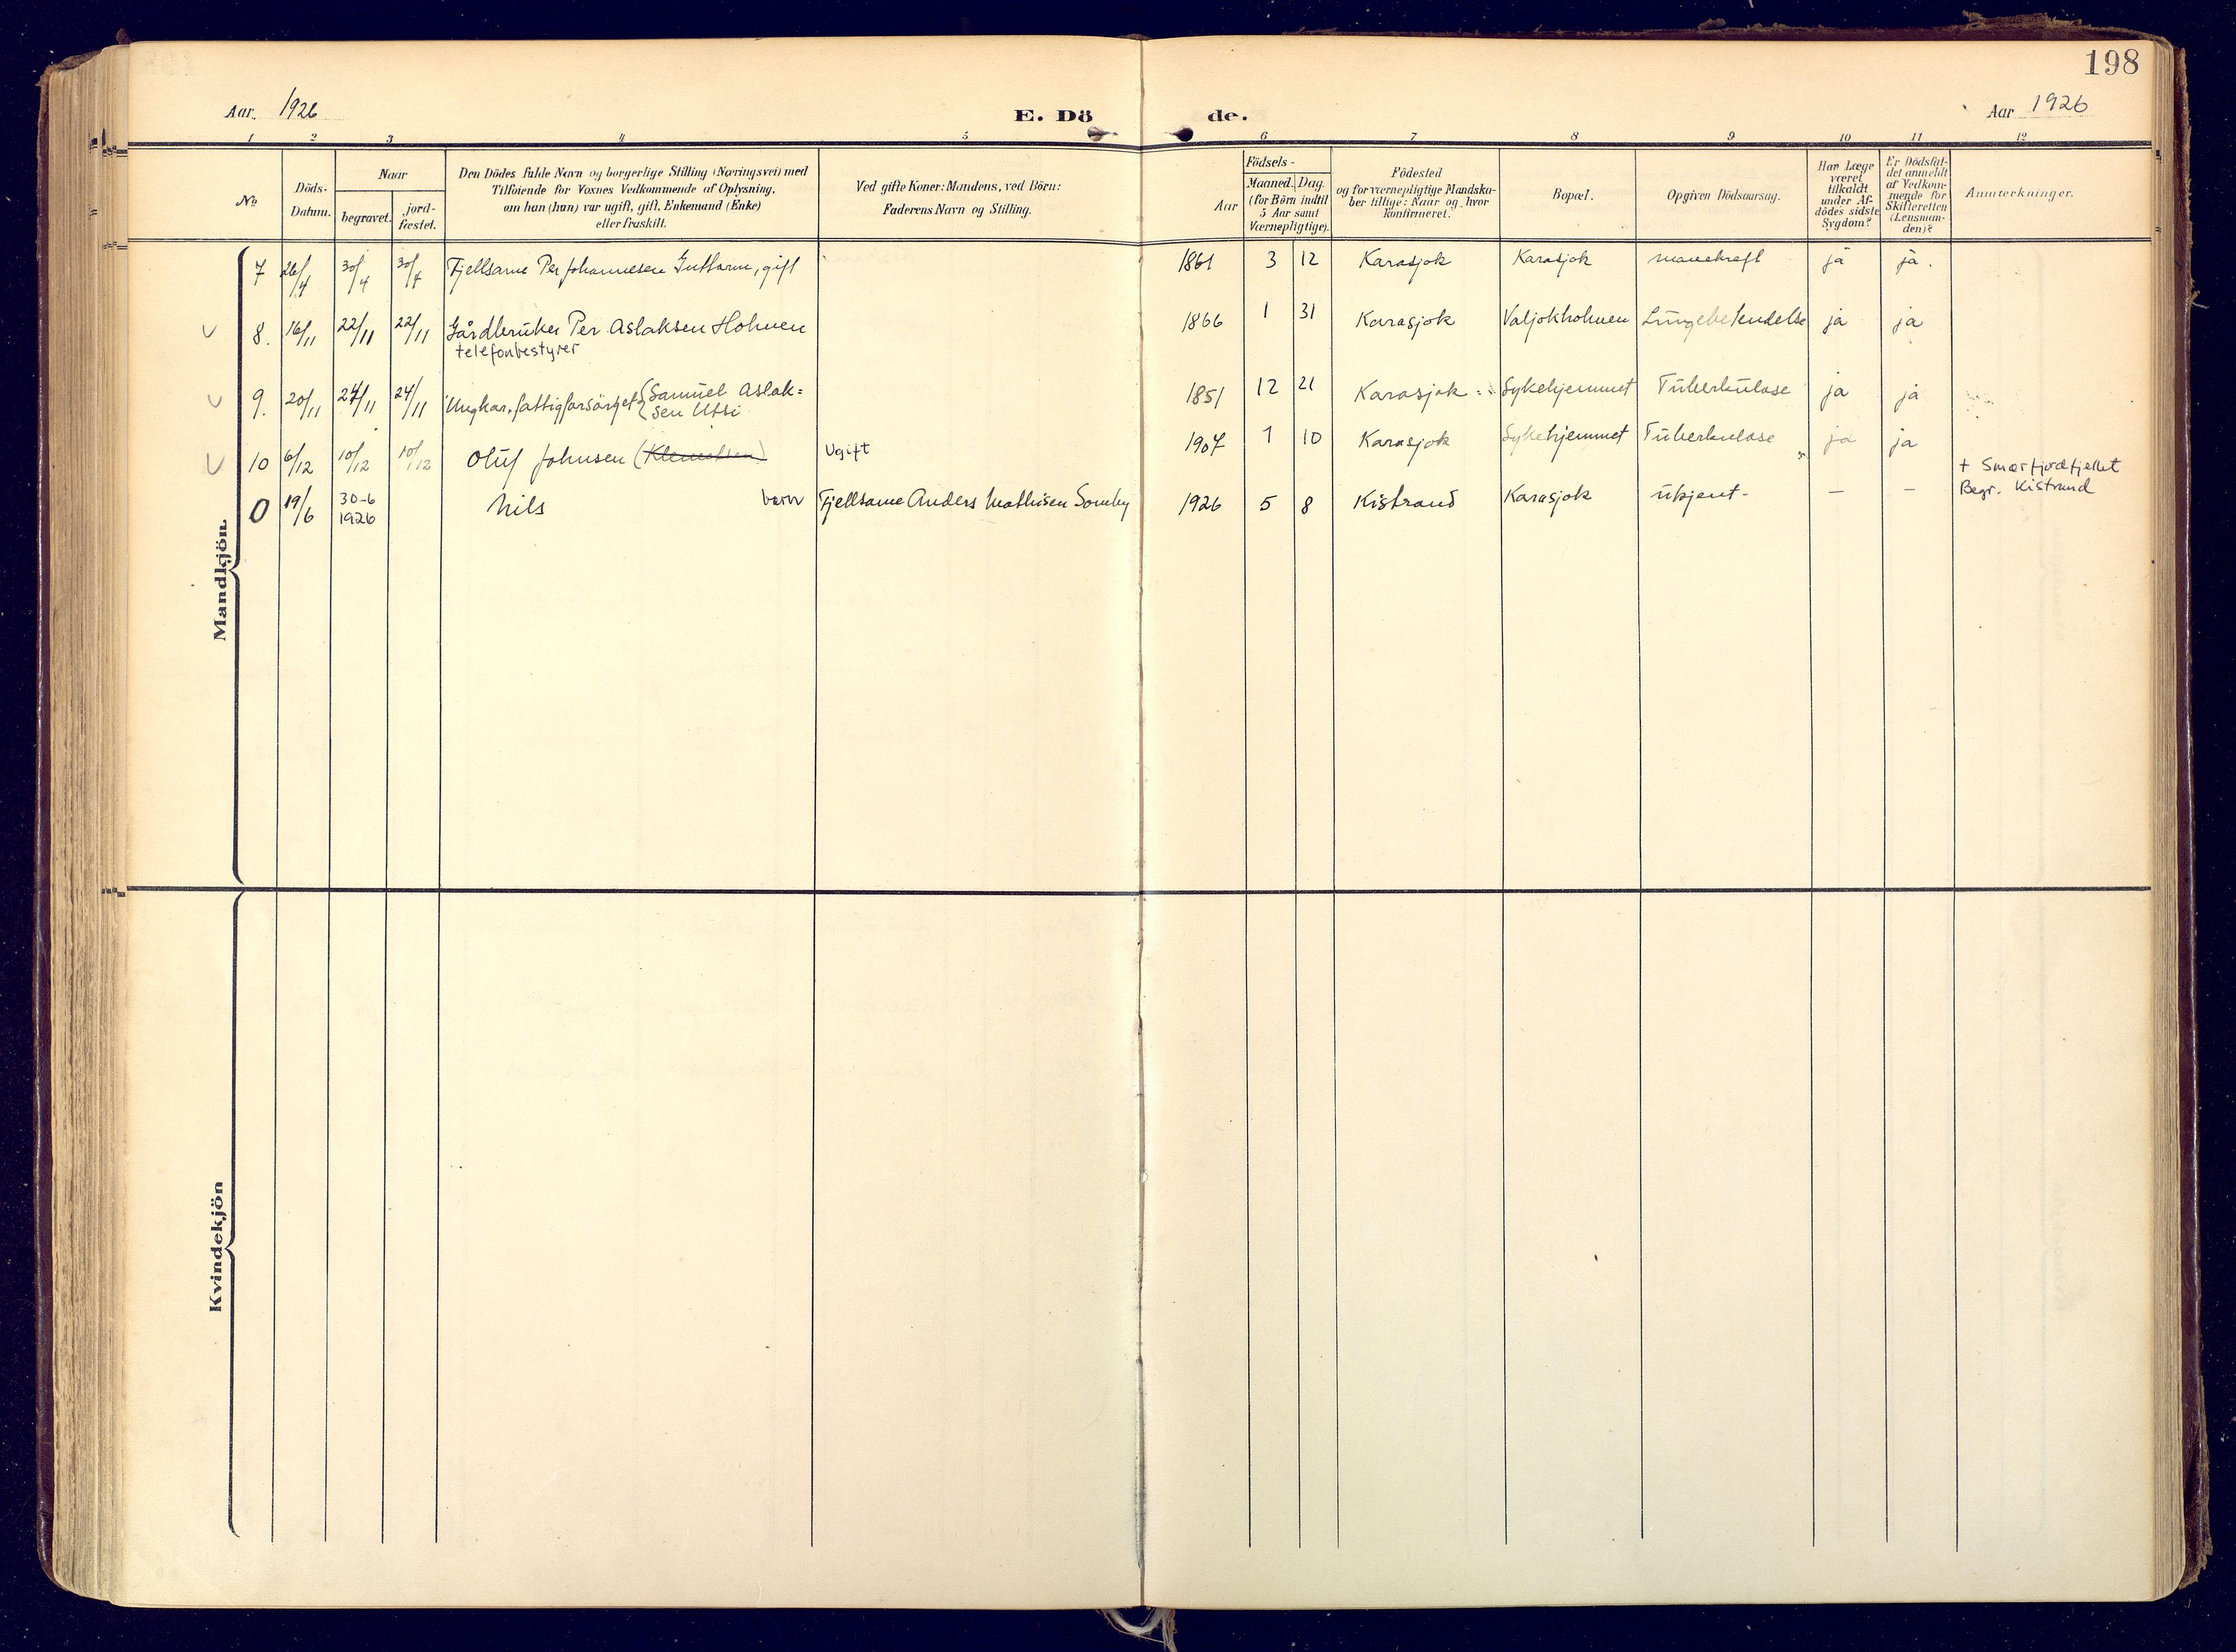 SATØ, Karasjok sokneprestkontor, H/Ha: Ministerialbok nr. 3, 1907-1926, s. 198